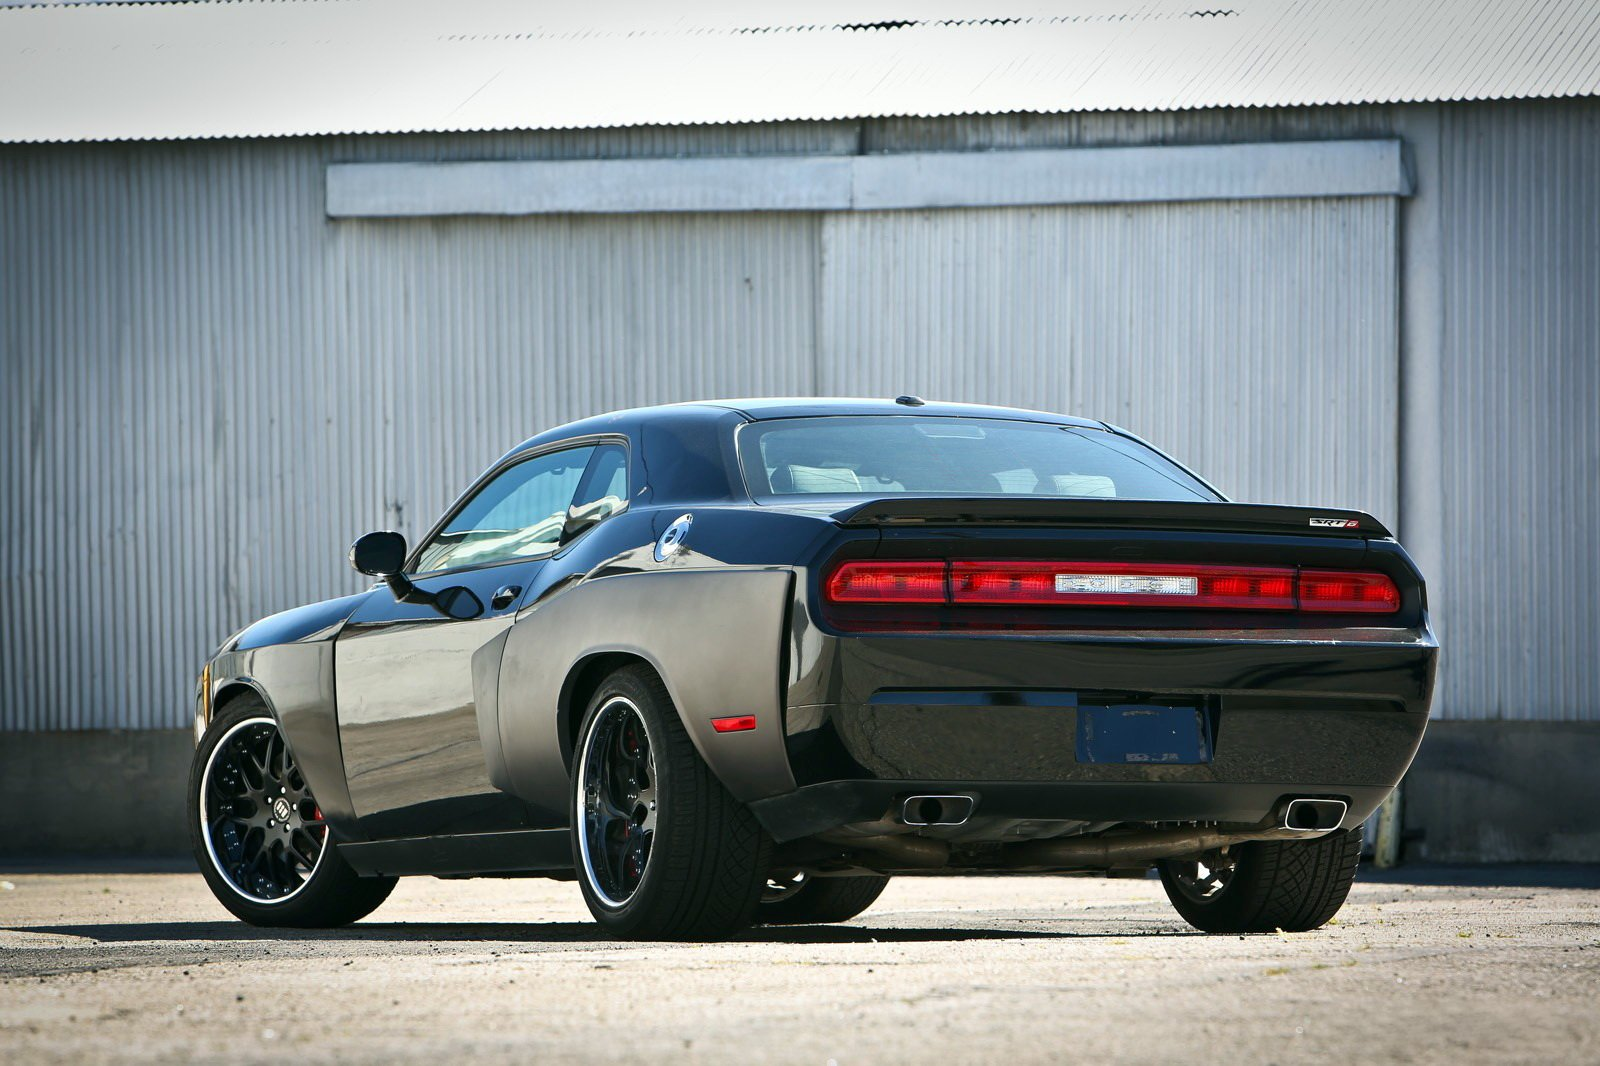 widebody challenger srt8 392 fast furious 6 movie cars wallpaper 1600x1066 630898 wallpaperup - Fast And Furious 6 Cars Wallpapers